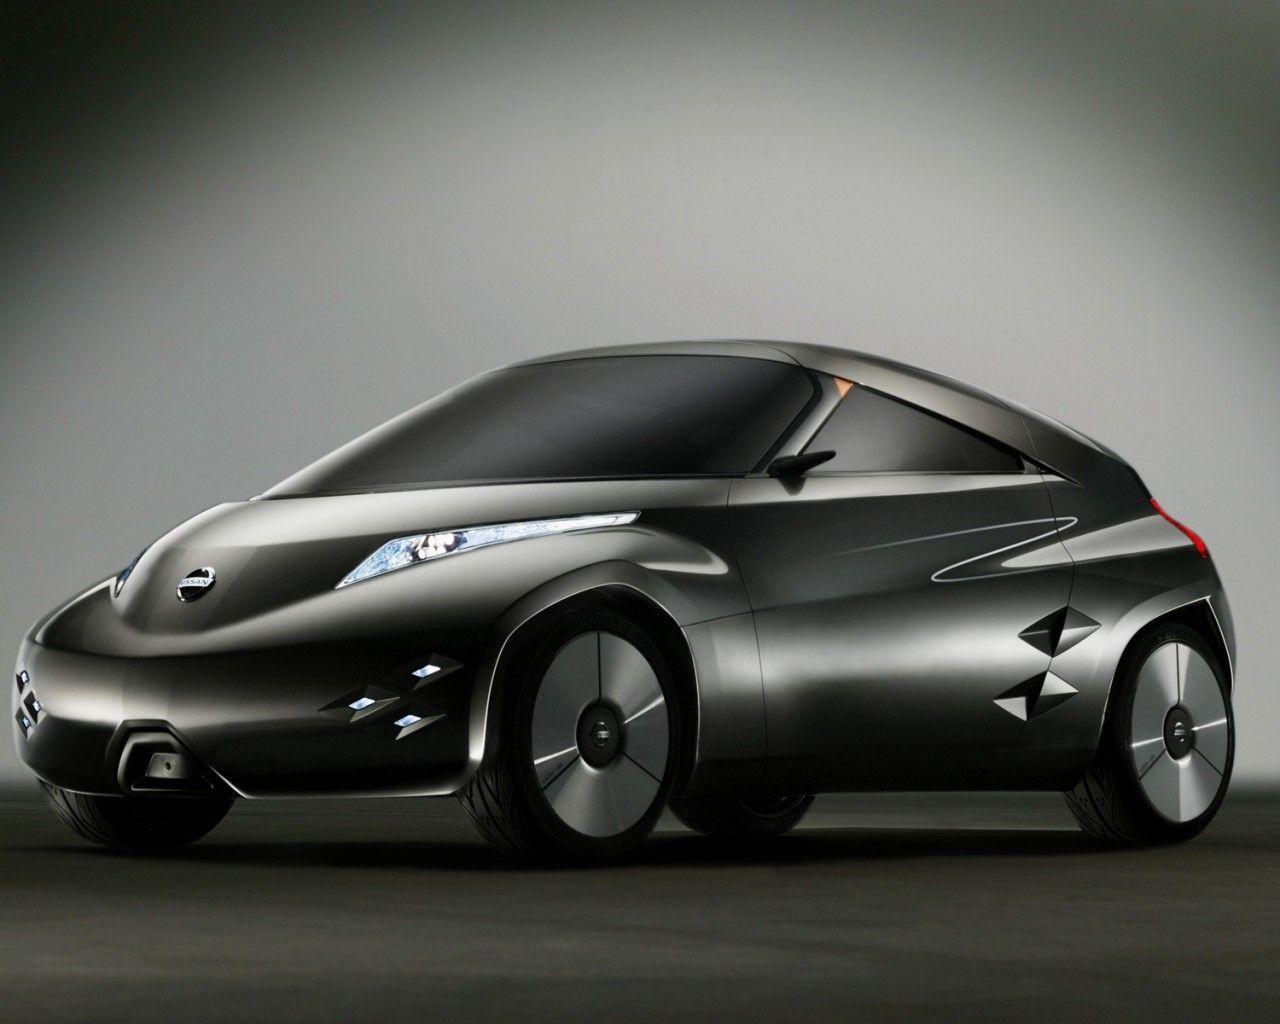 Nissan Concept Car Wallpaper With Images Concept Cars Car Nissan